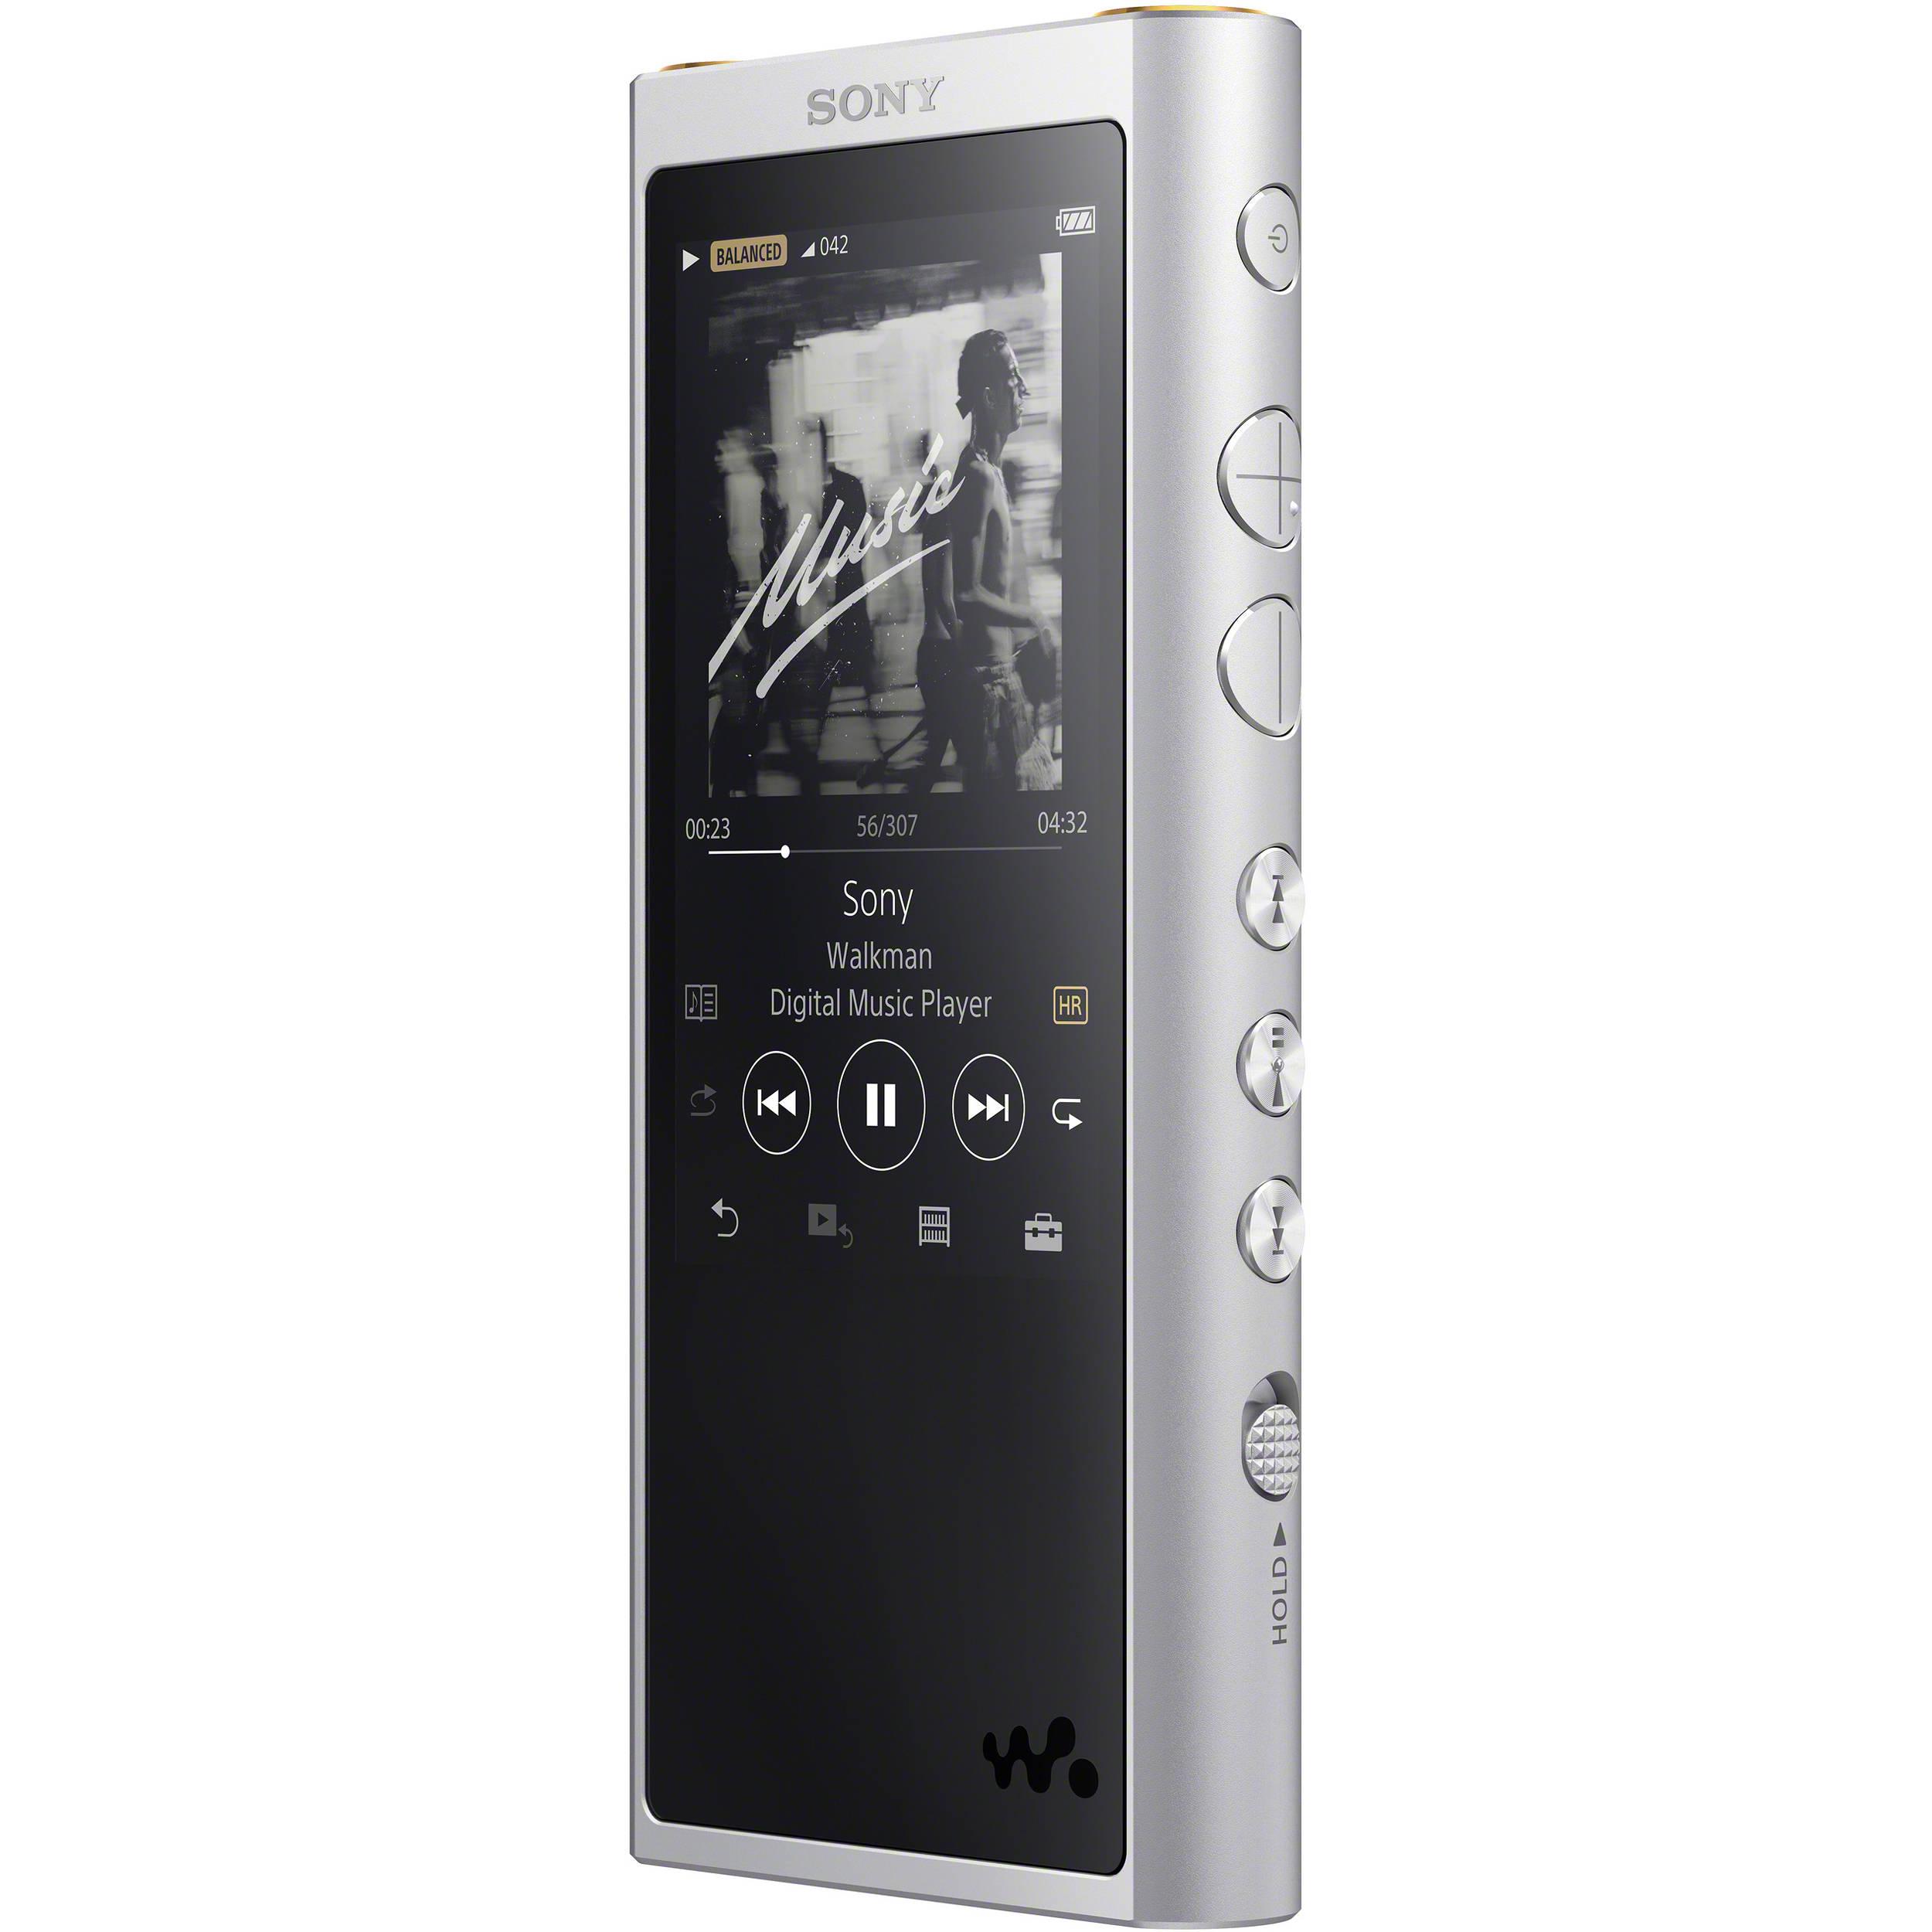 Sony Walkman MP3 Drivers Download - Update Sony Software